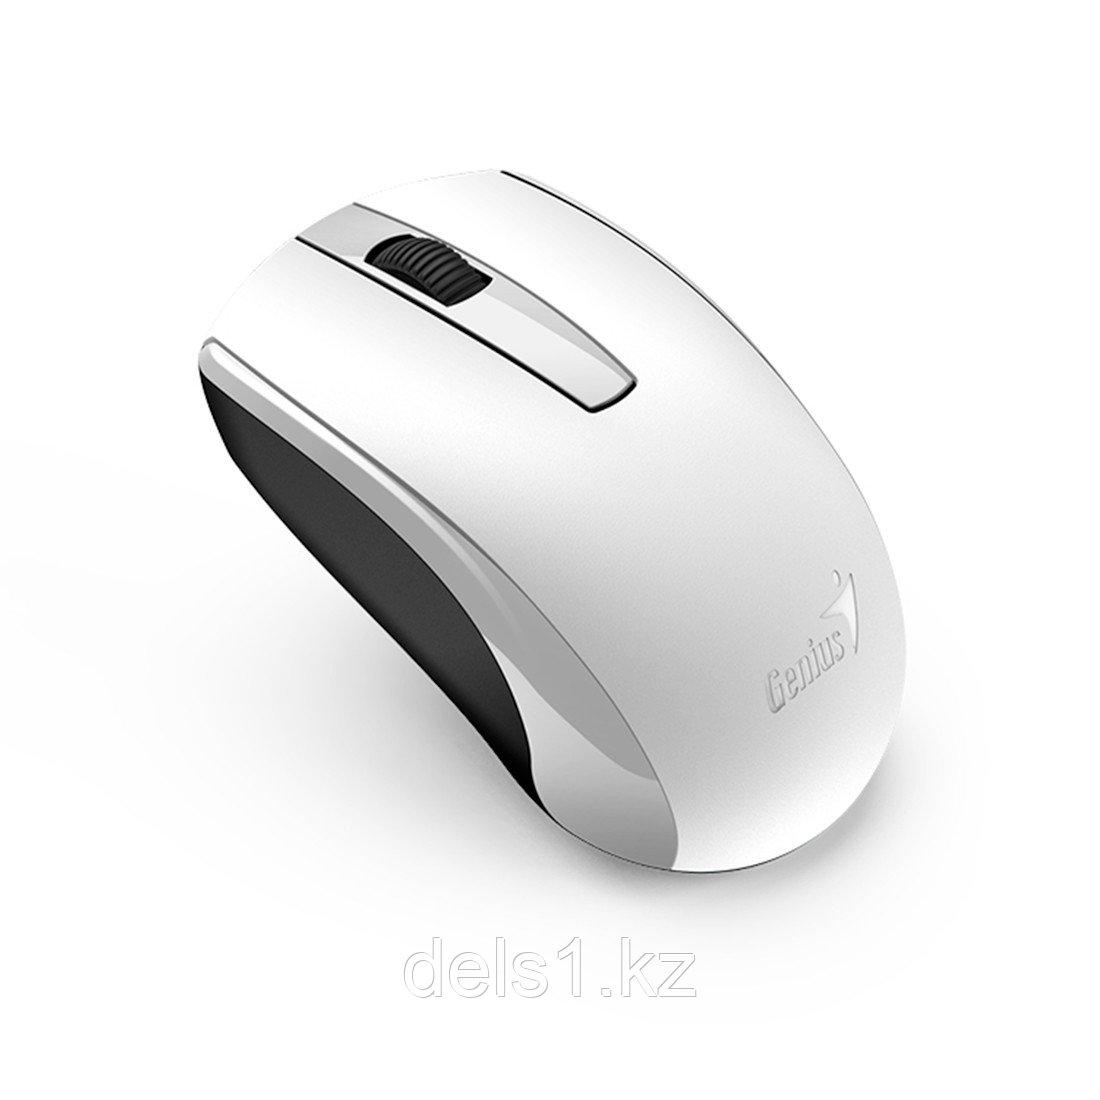 Компьютерная мышь Genius ECO-8100 White